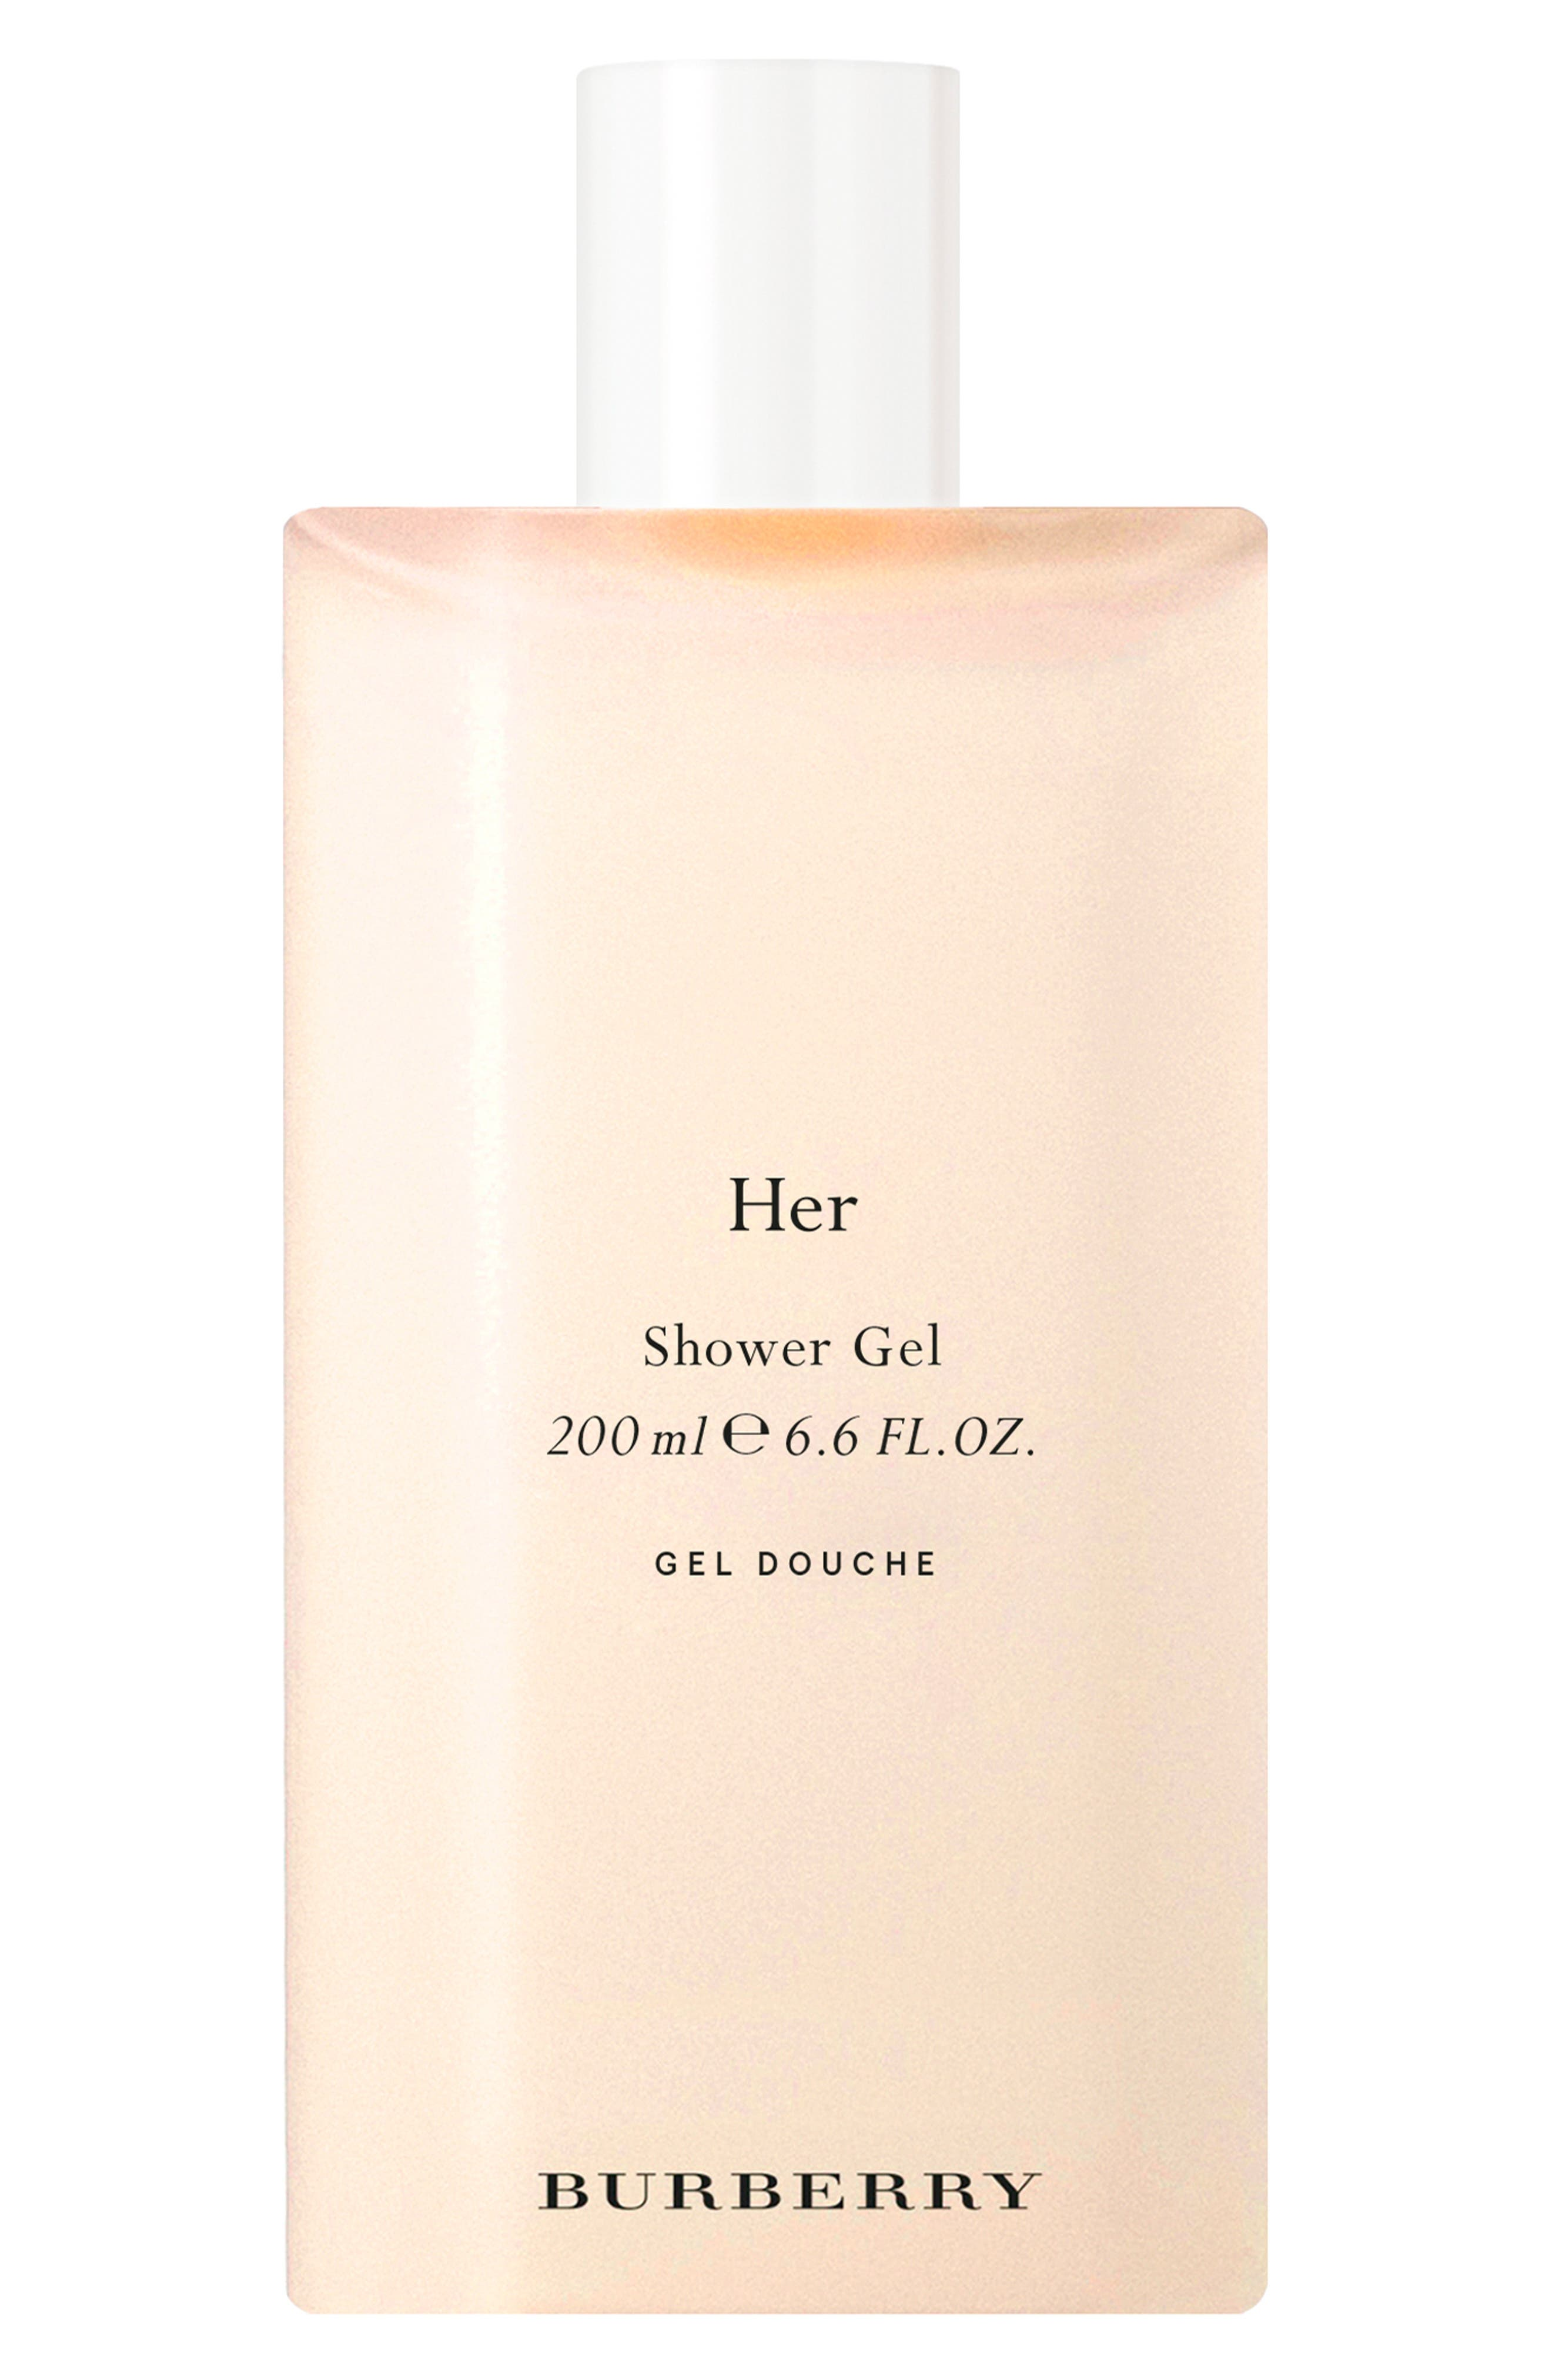 Burberry Her Shower Gel